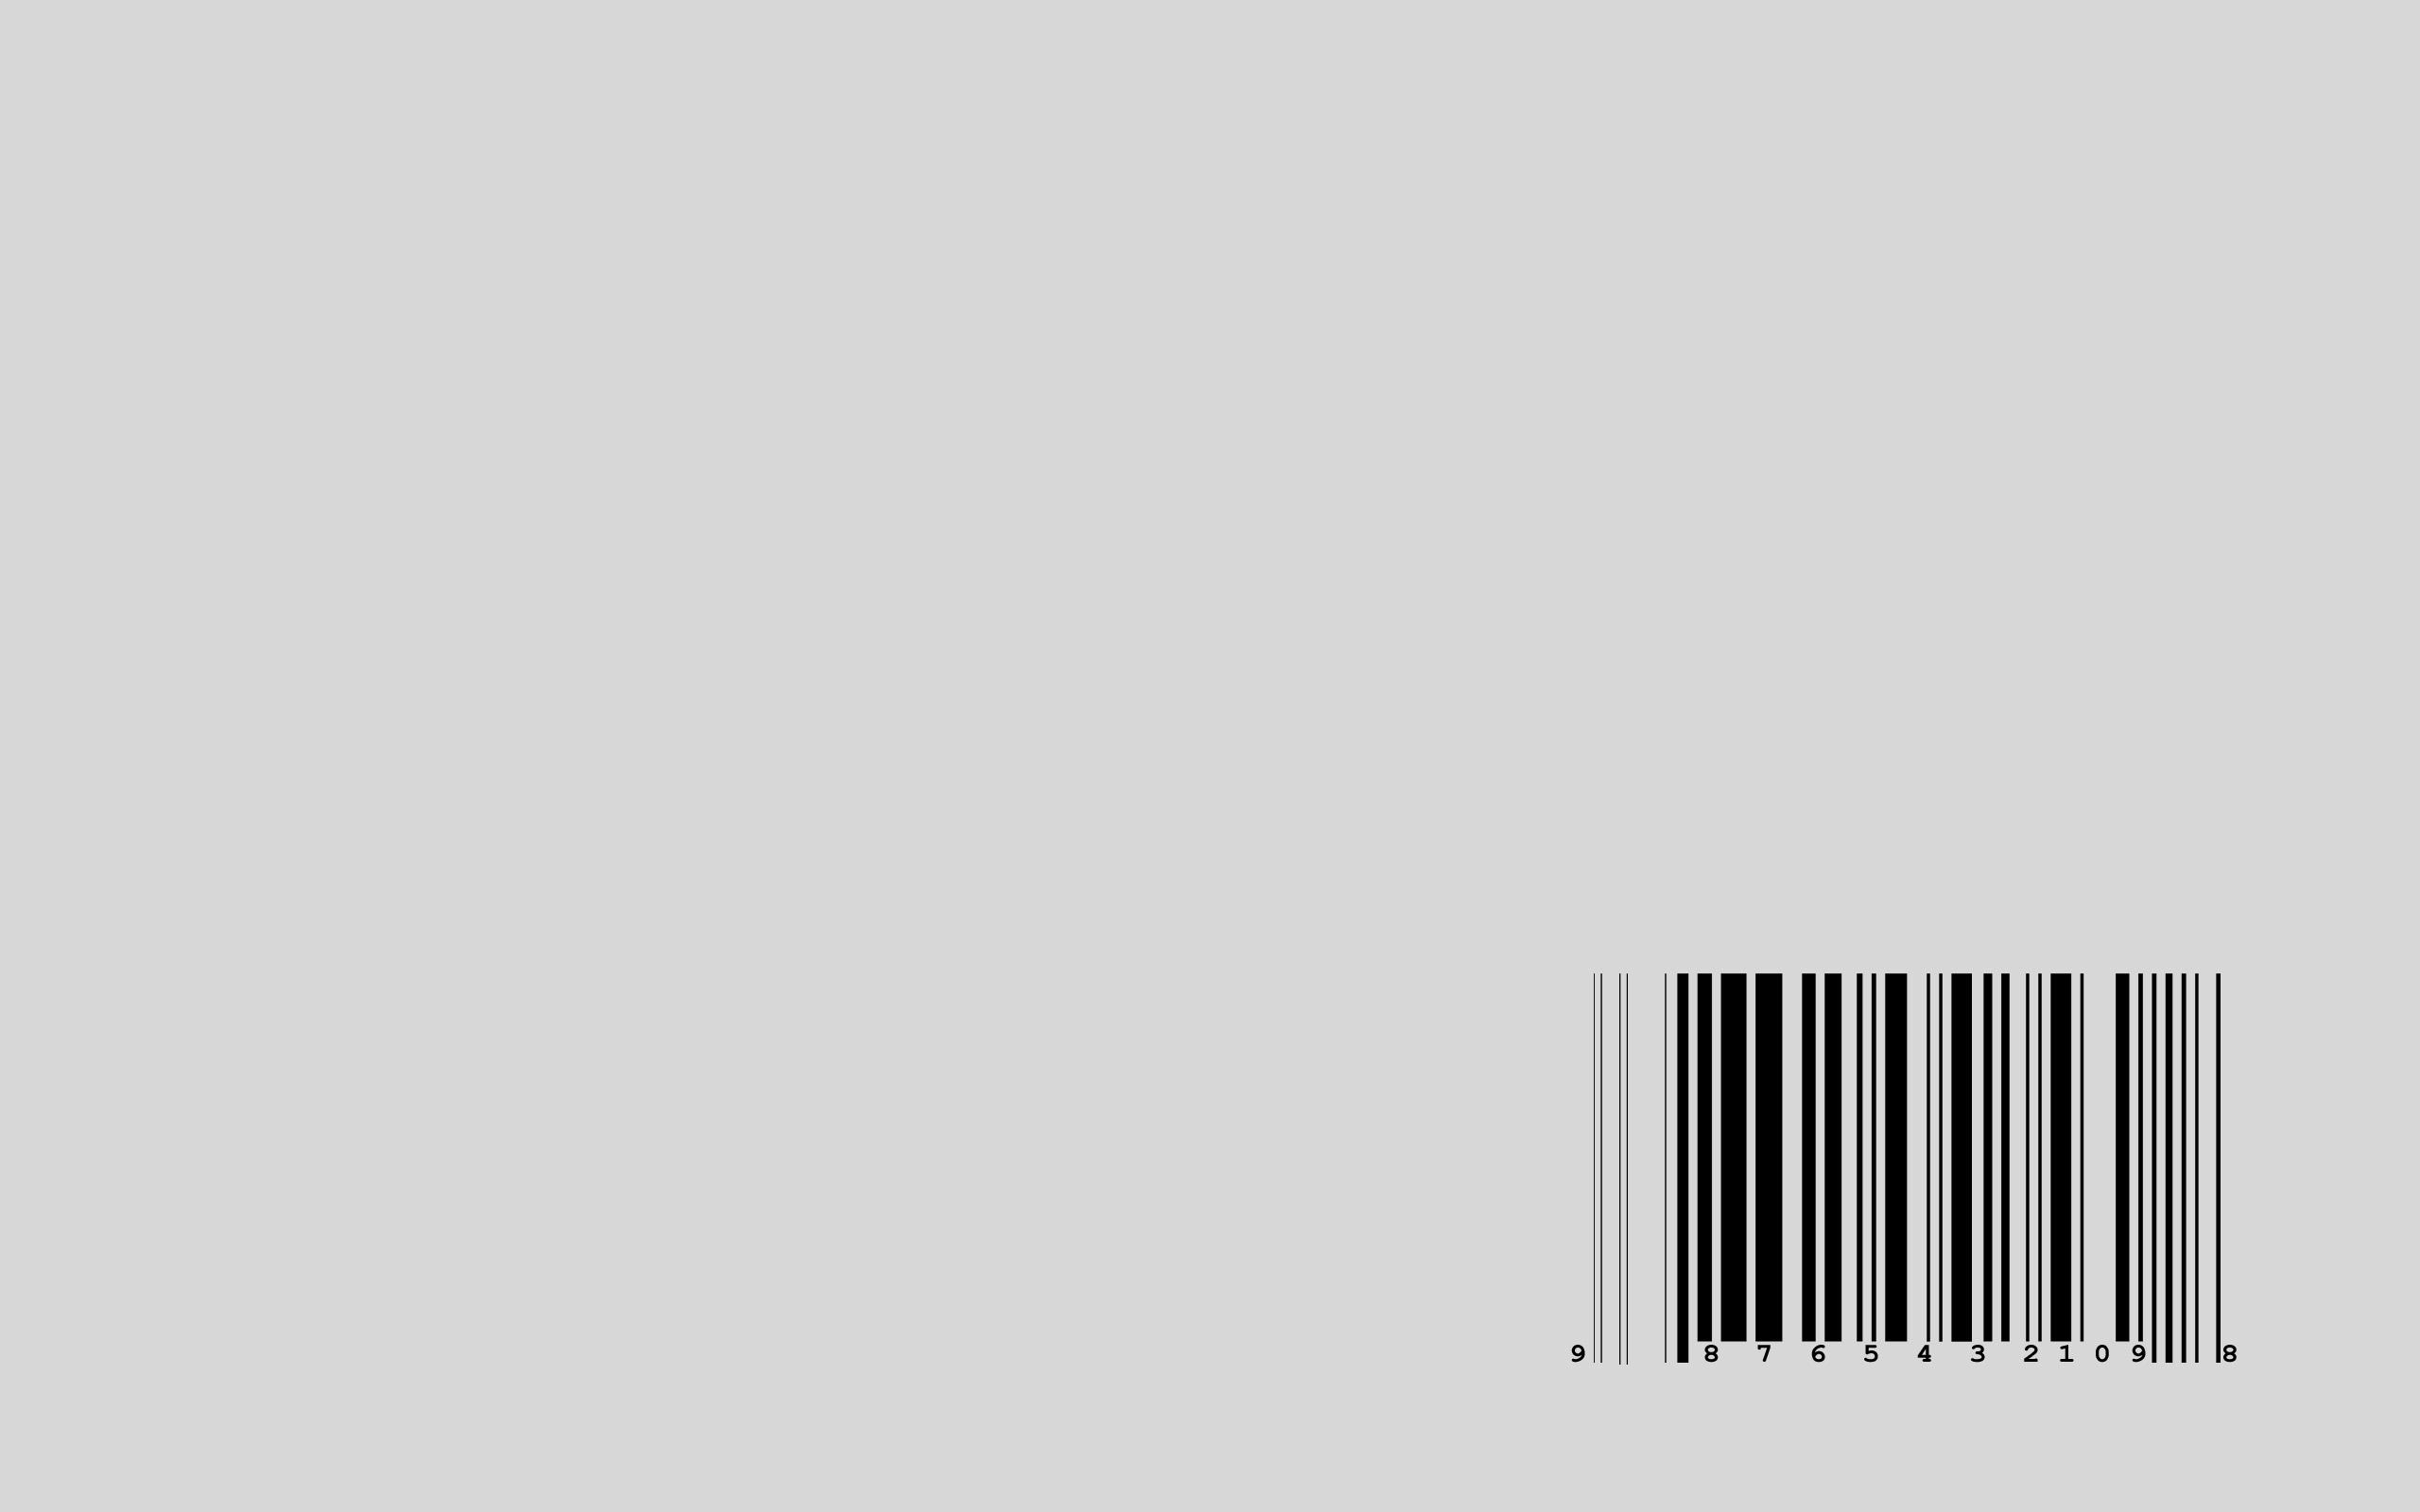 Simple Wallpaper Macbook Minimalist - code  Trends_807753.jpg